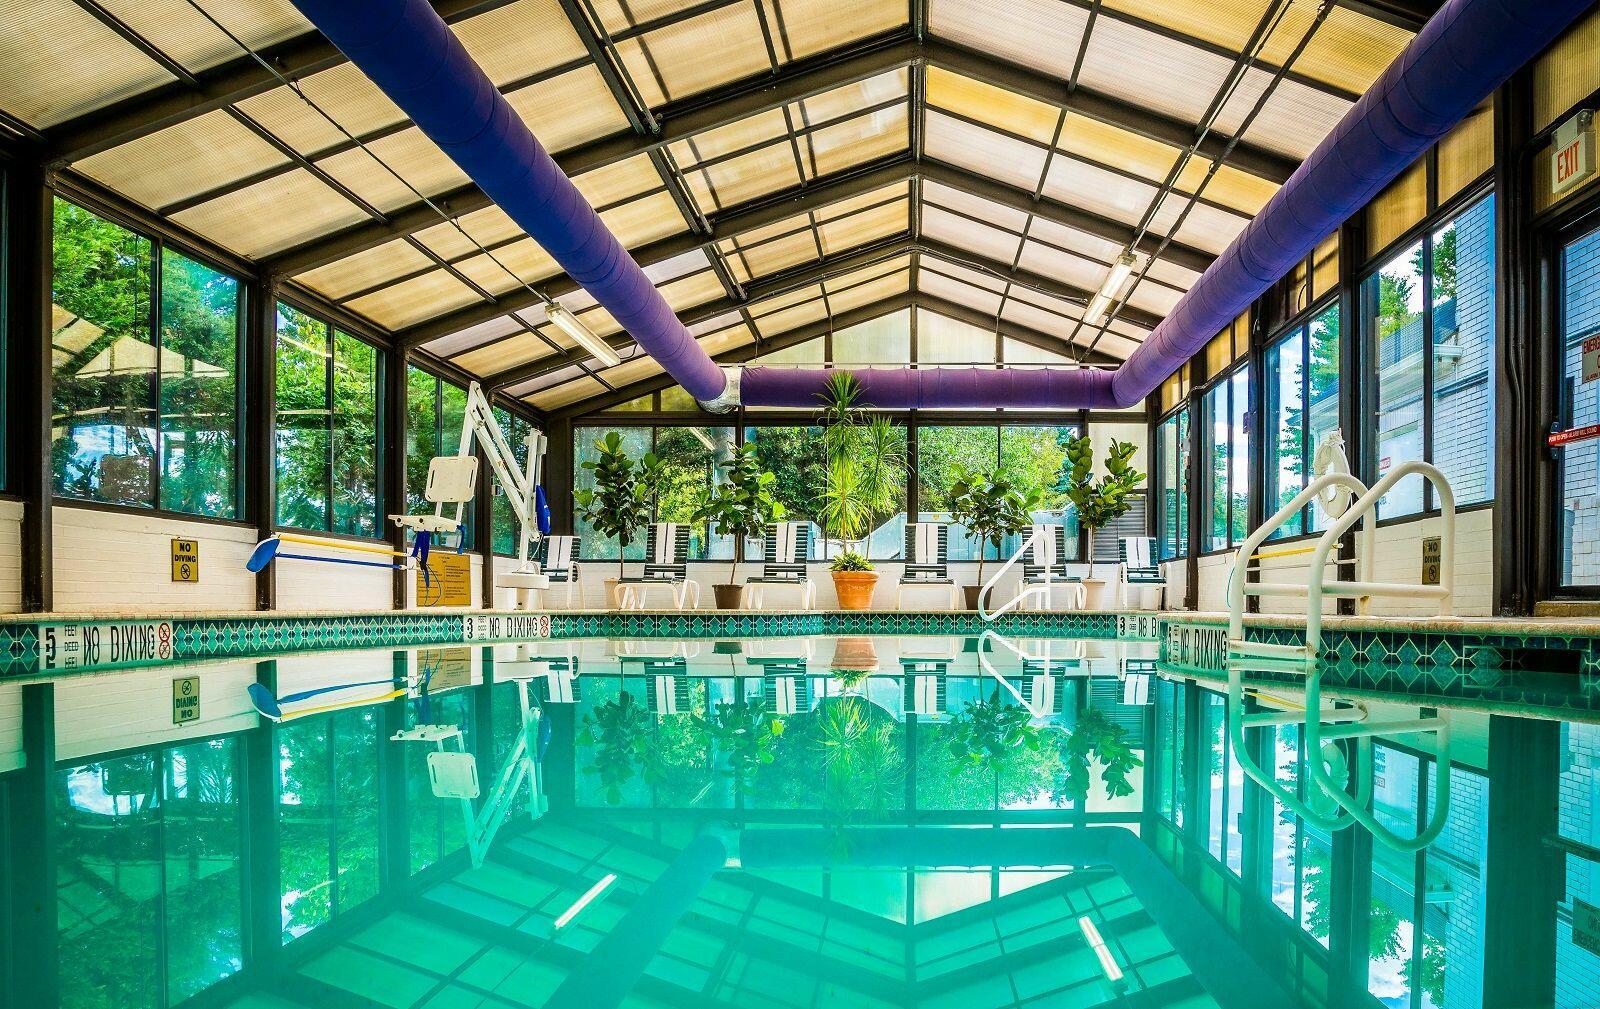 Indoor pool and jacuzzi